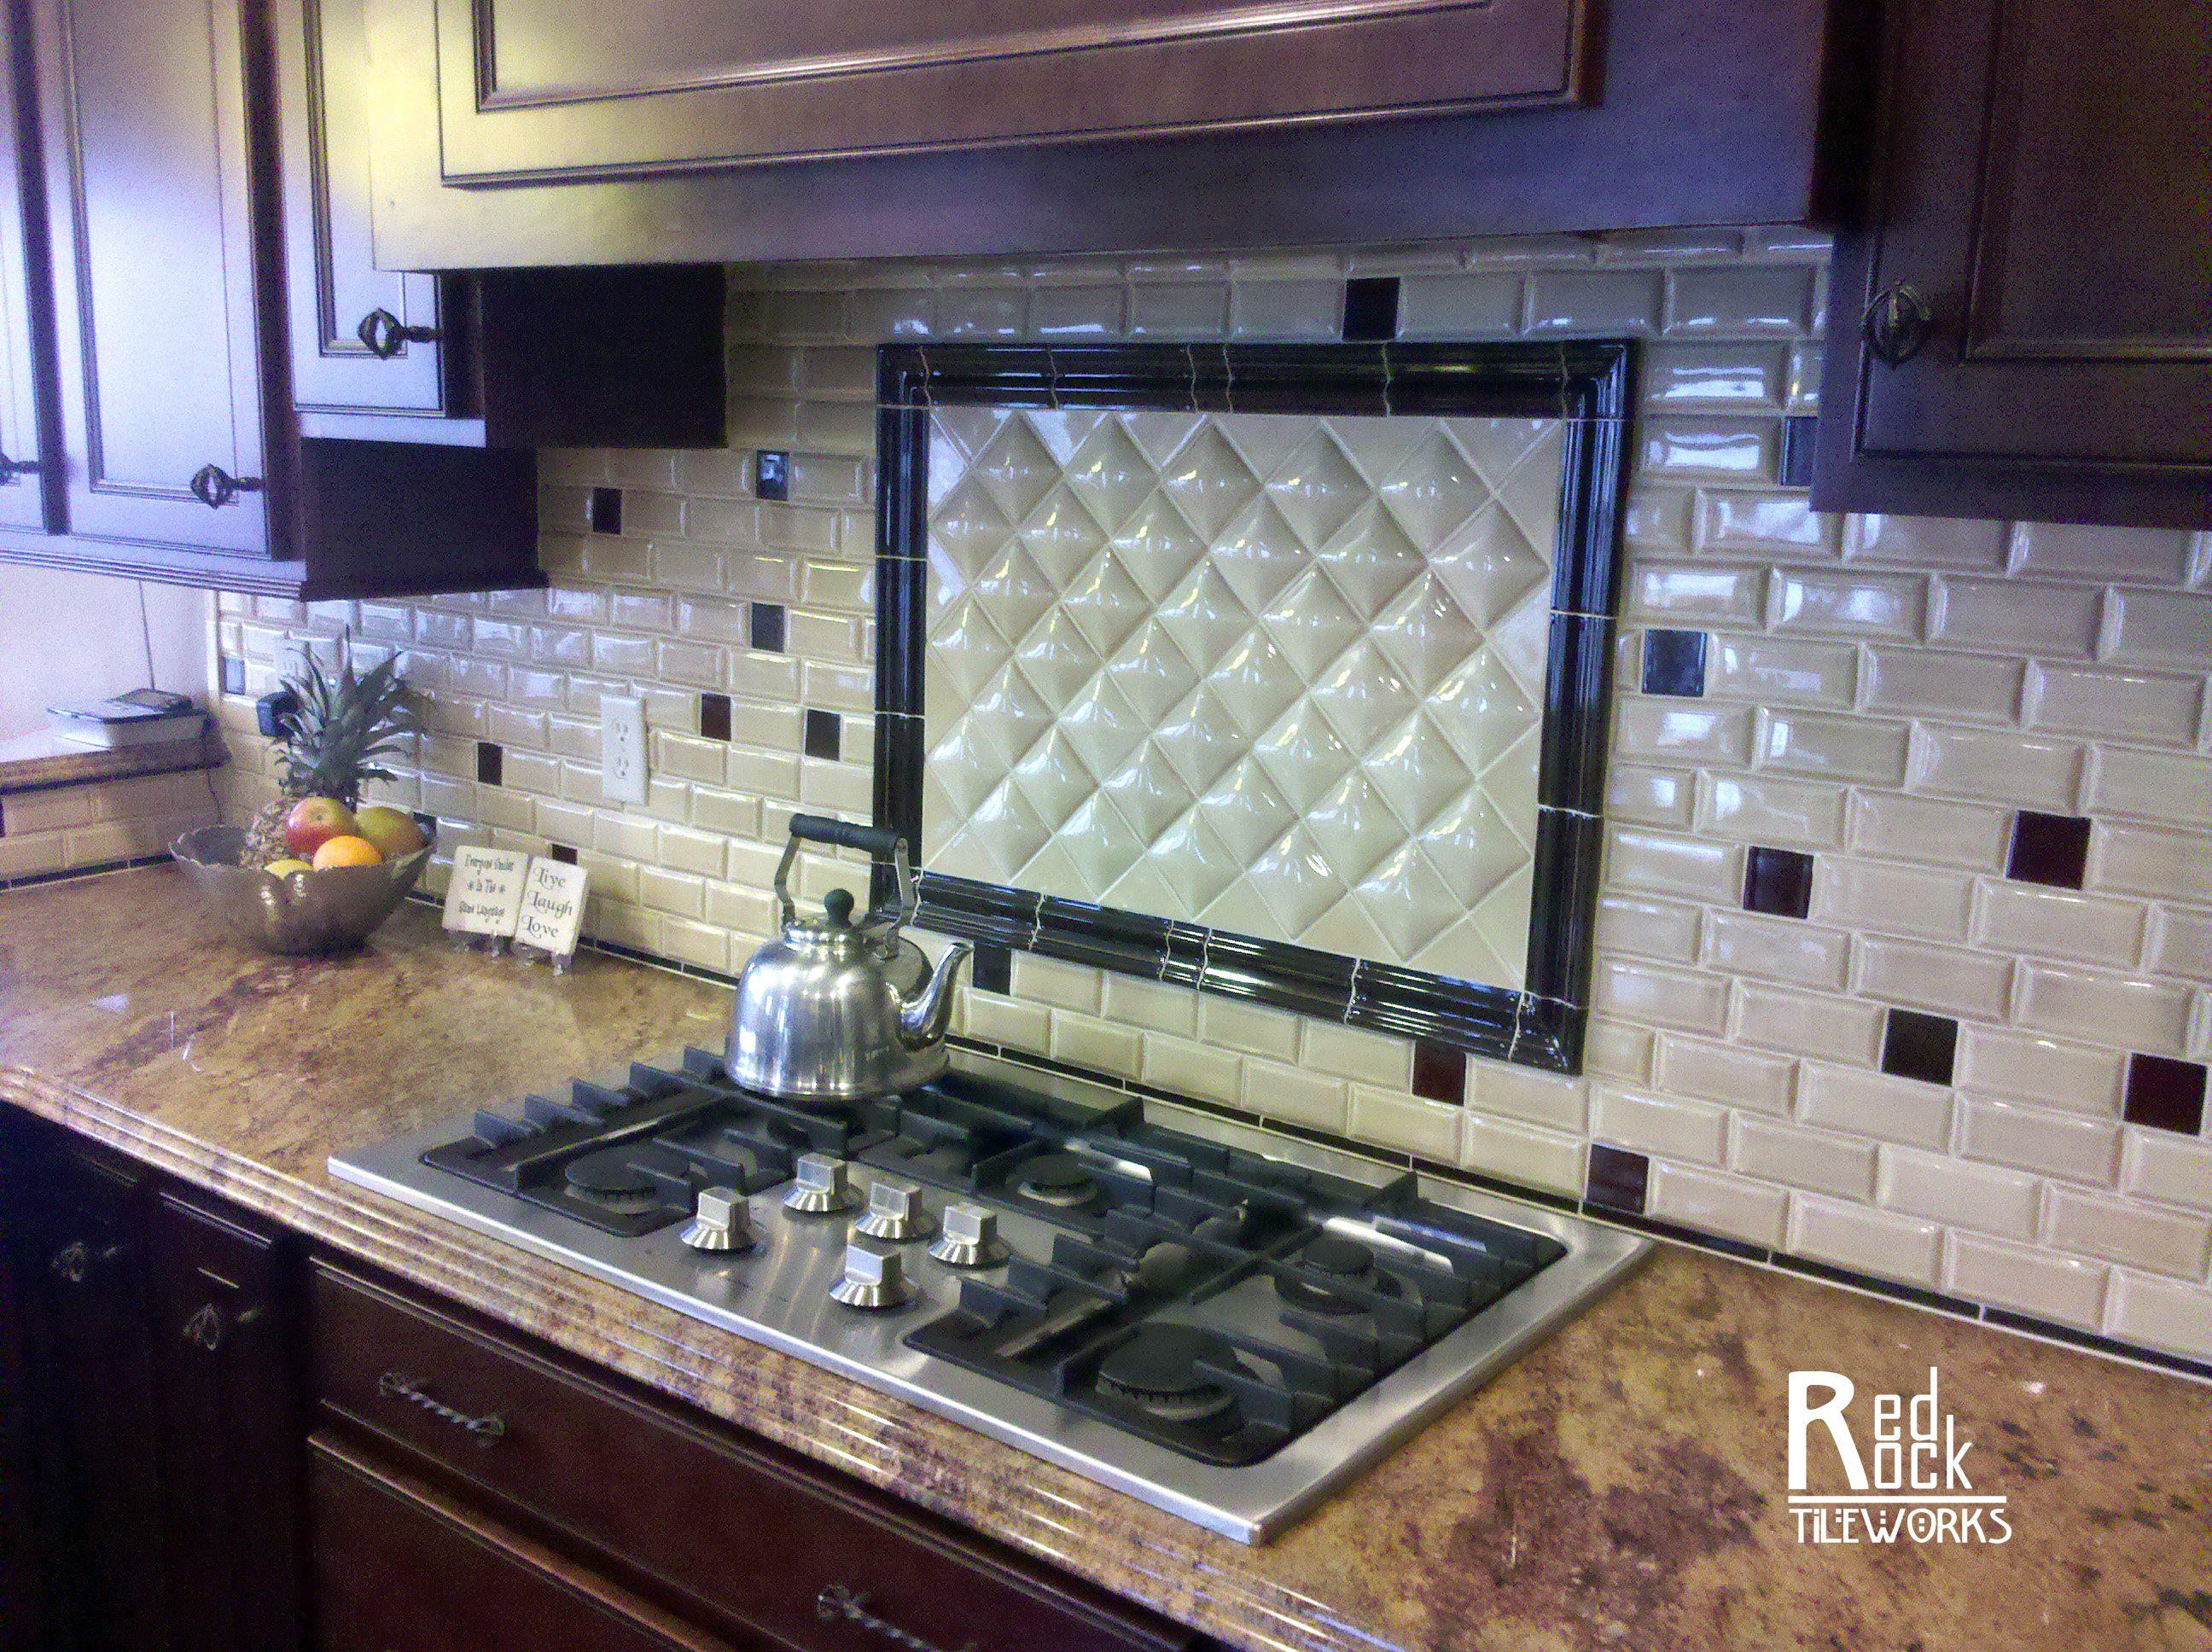 backsplash tile backsplash kitchen